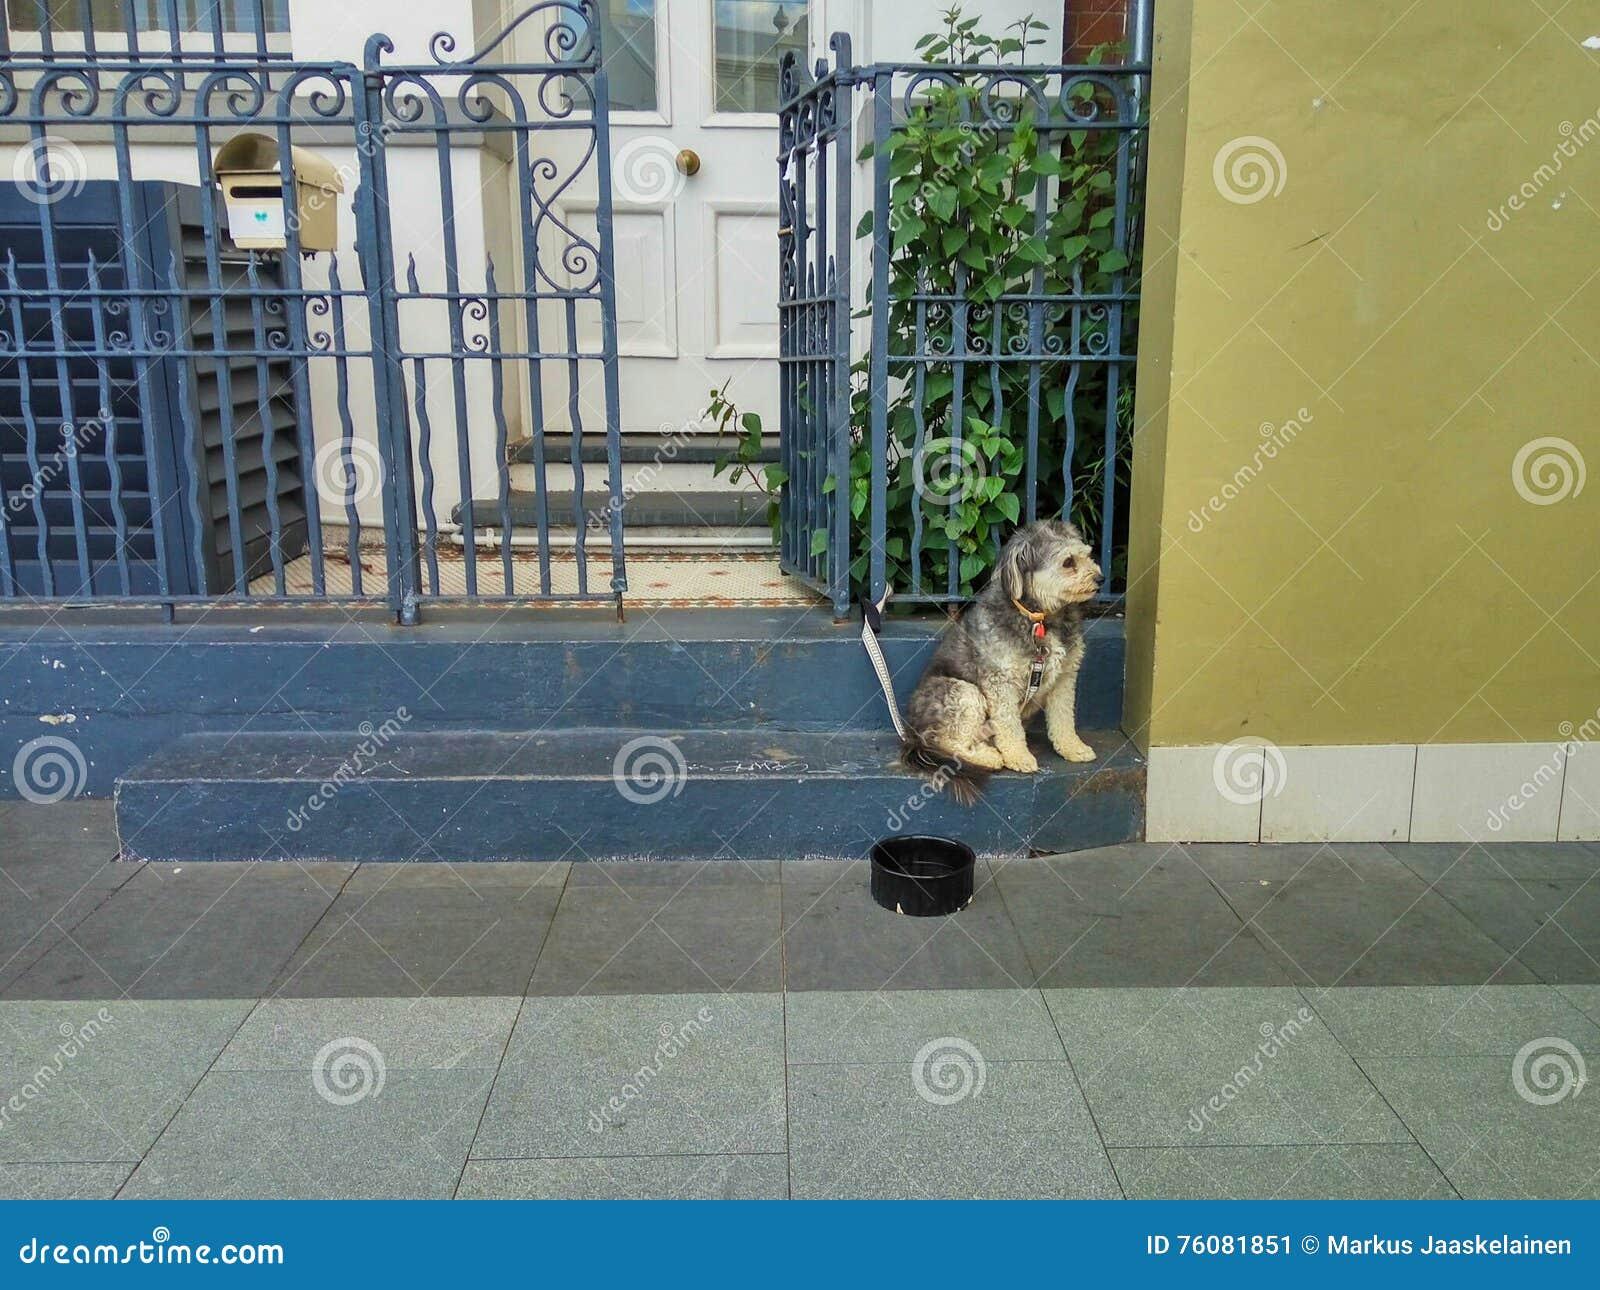 Dog at House Gate